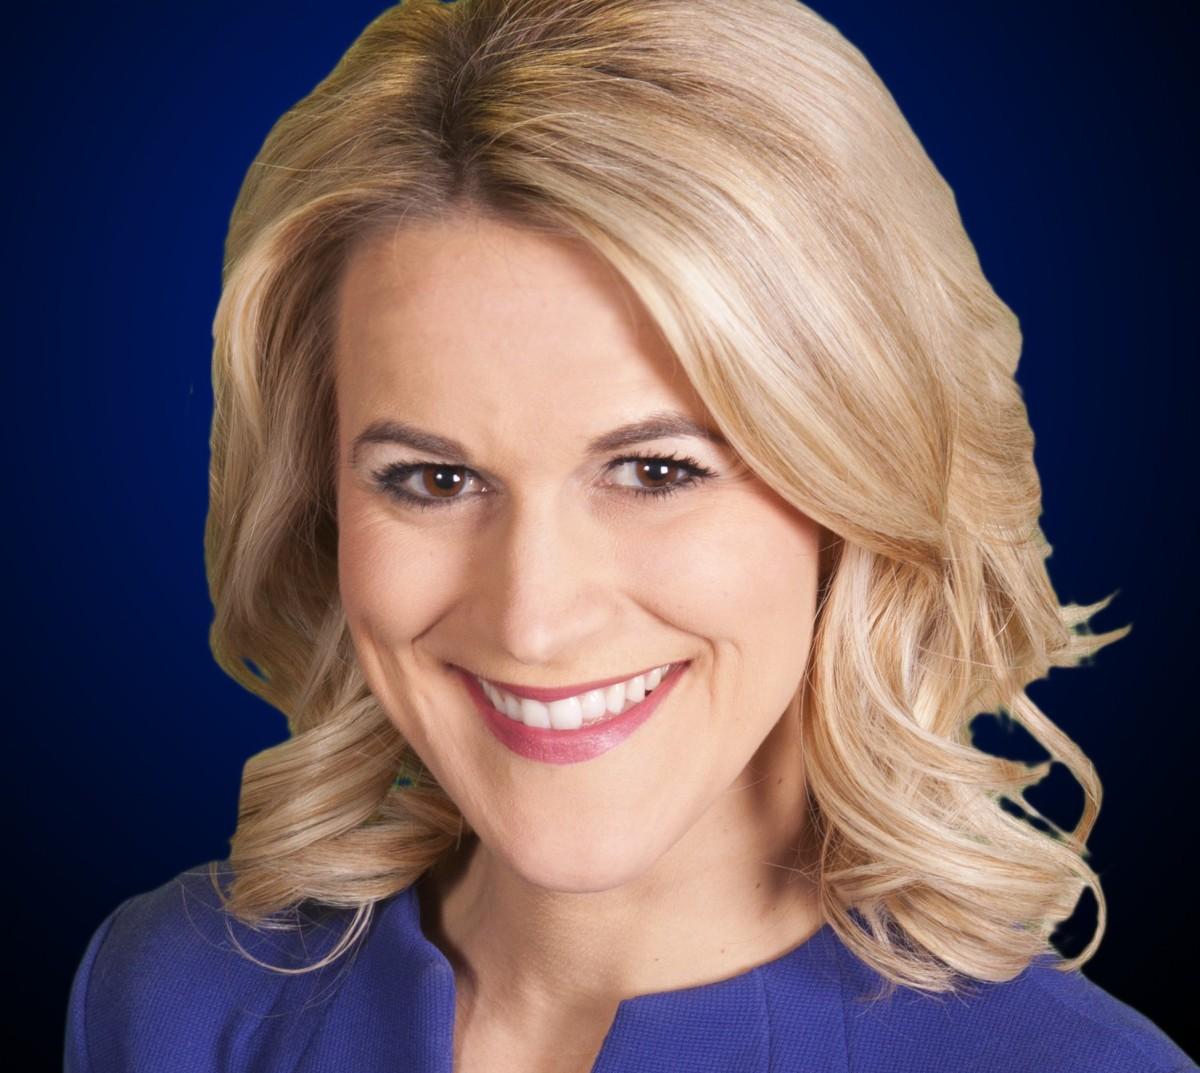 Danielle lewis attorney - Danielle Lewis Attorney 18